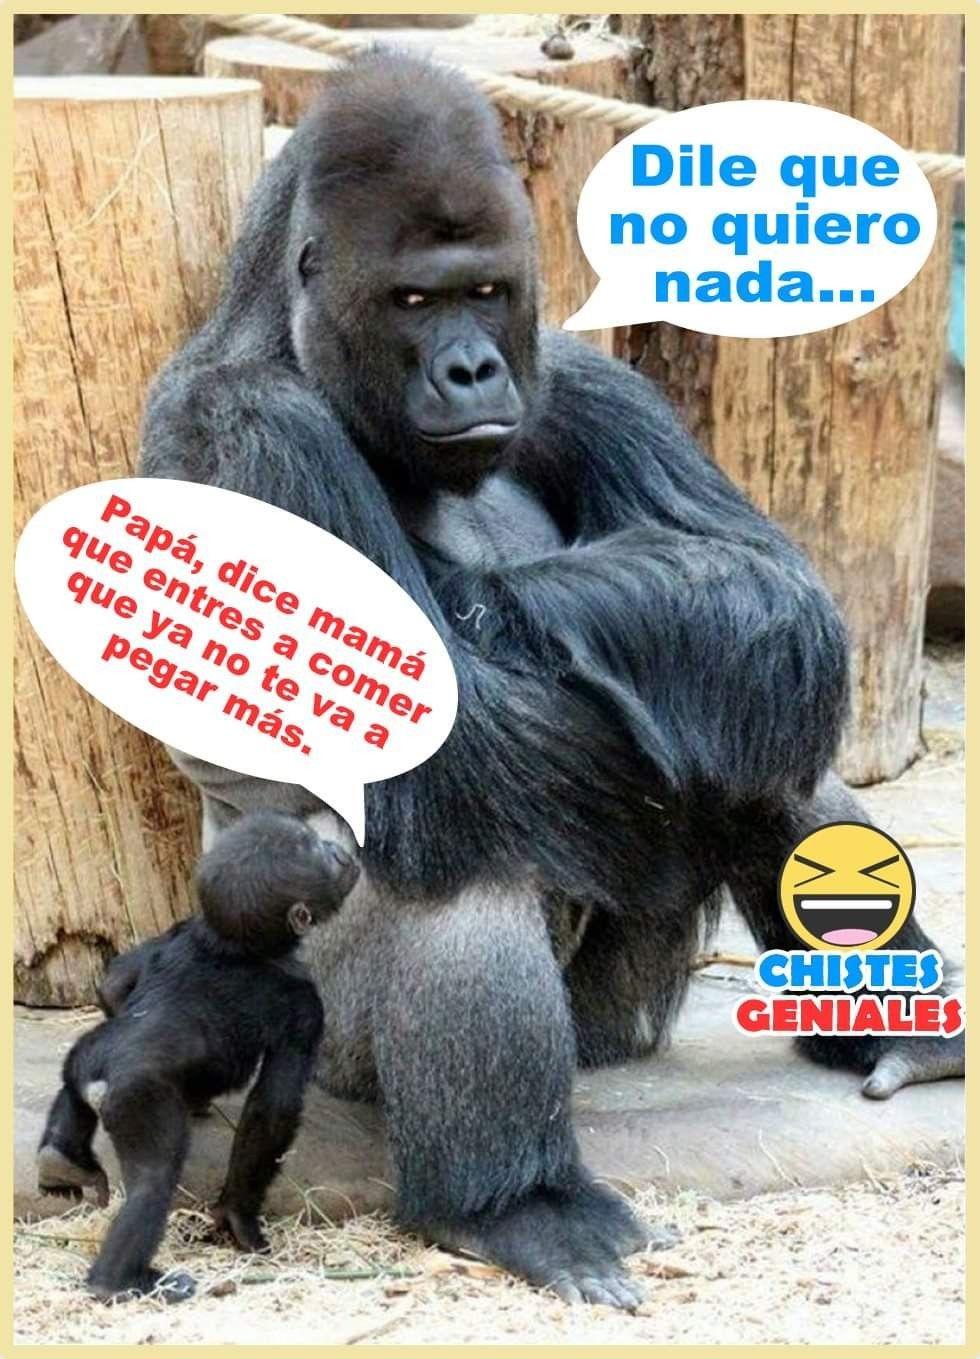 Pin By Marisol Villalba Fuentes On Meme Gracioso Funny Baby Memes Funny Memes Funny Babies